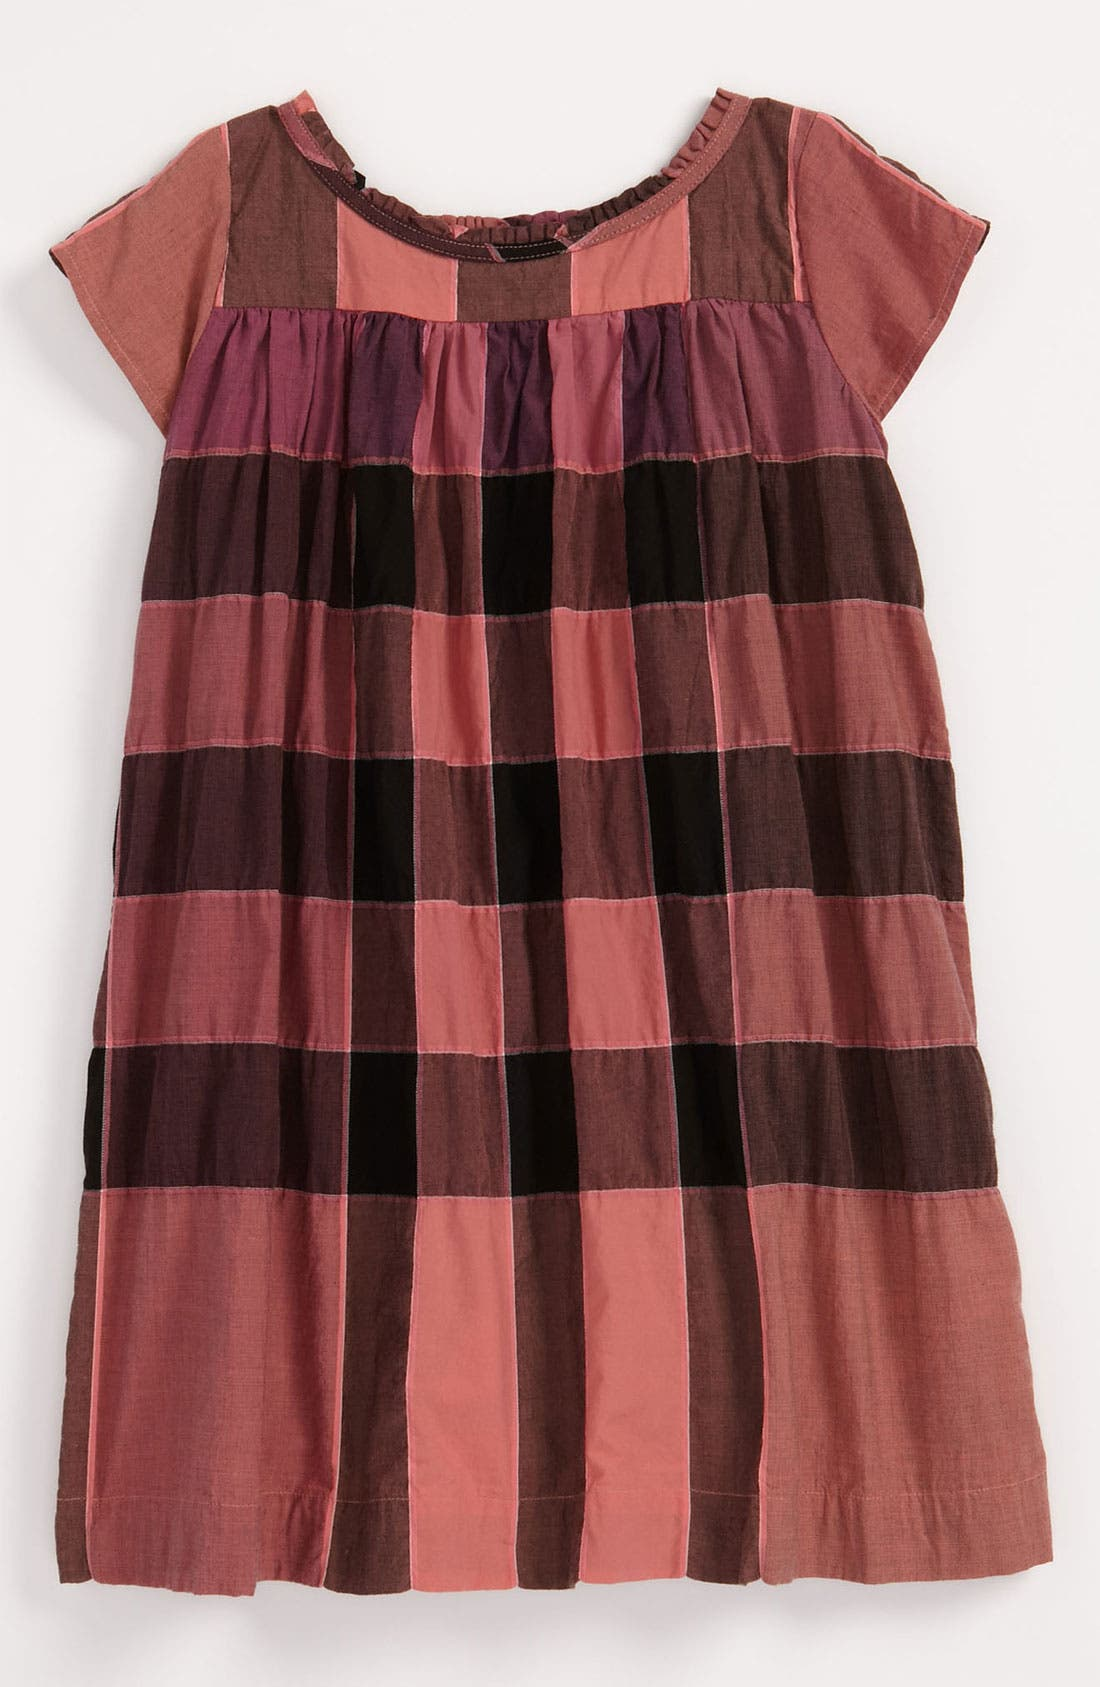 Alternate Image 1 Selected - Burberry Check Print Dress (Toddler)